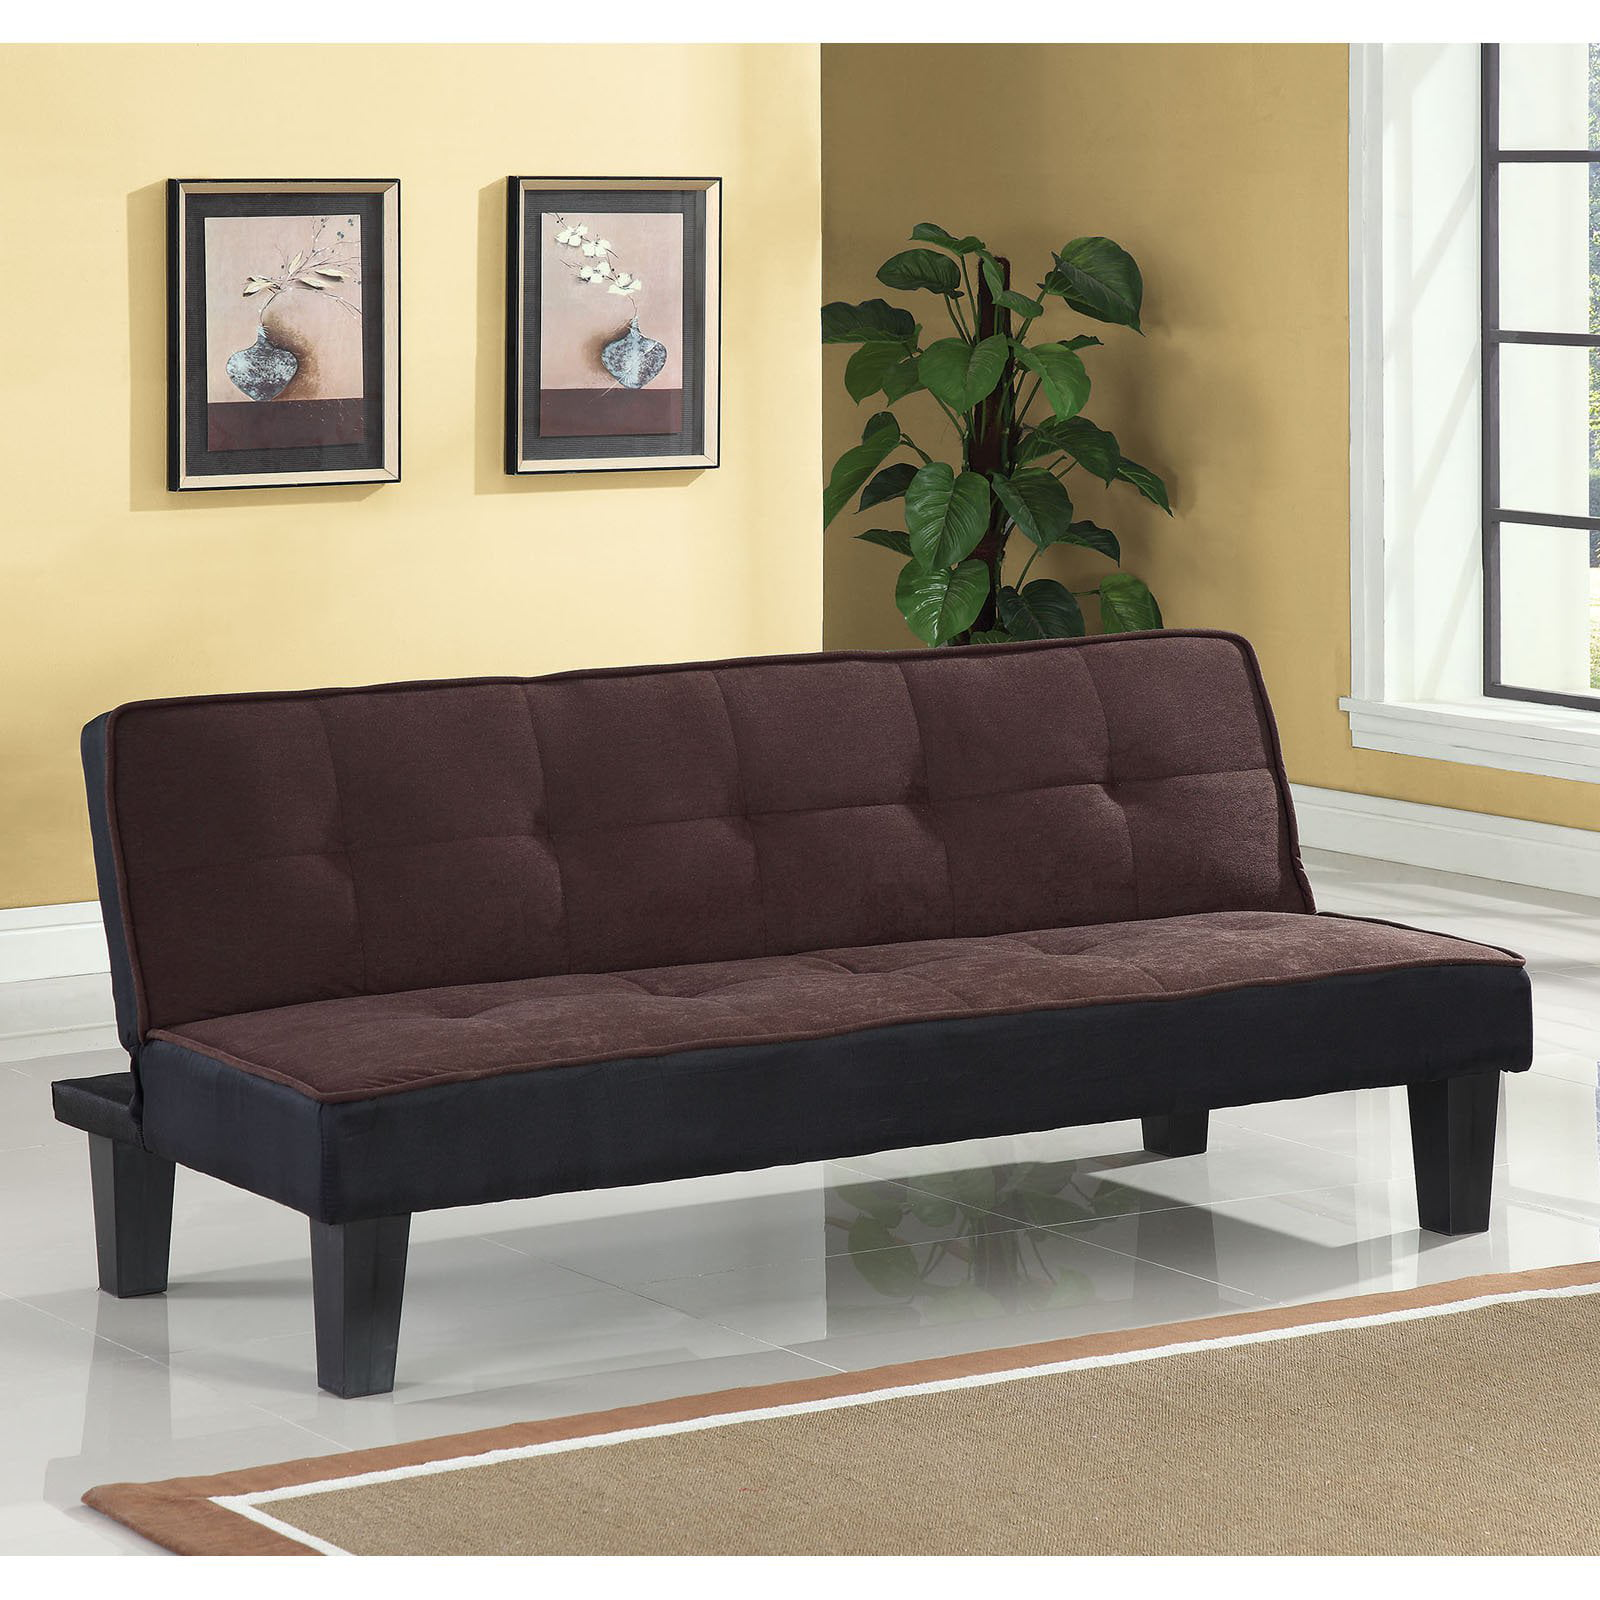 Acme Furniture Hamar Flannel Futon Sofa, Multiple Colors by Acme Furniture